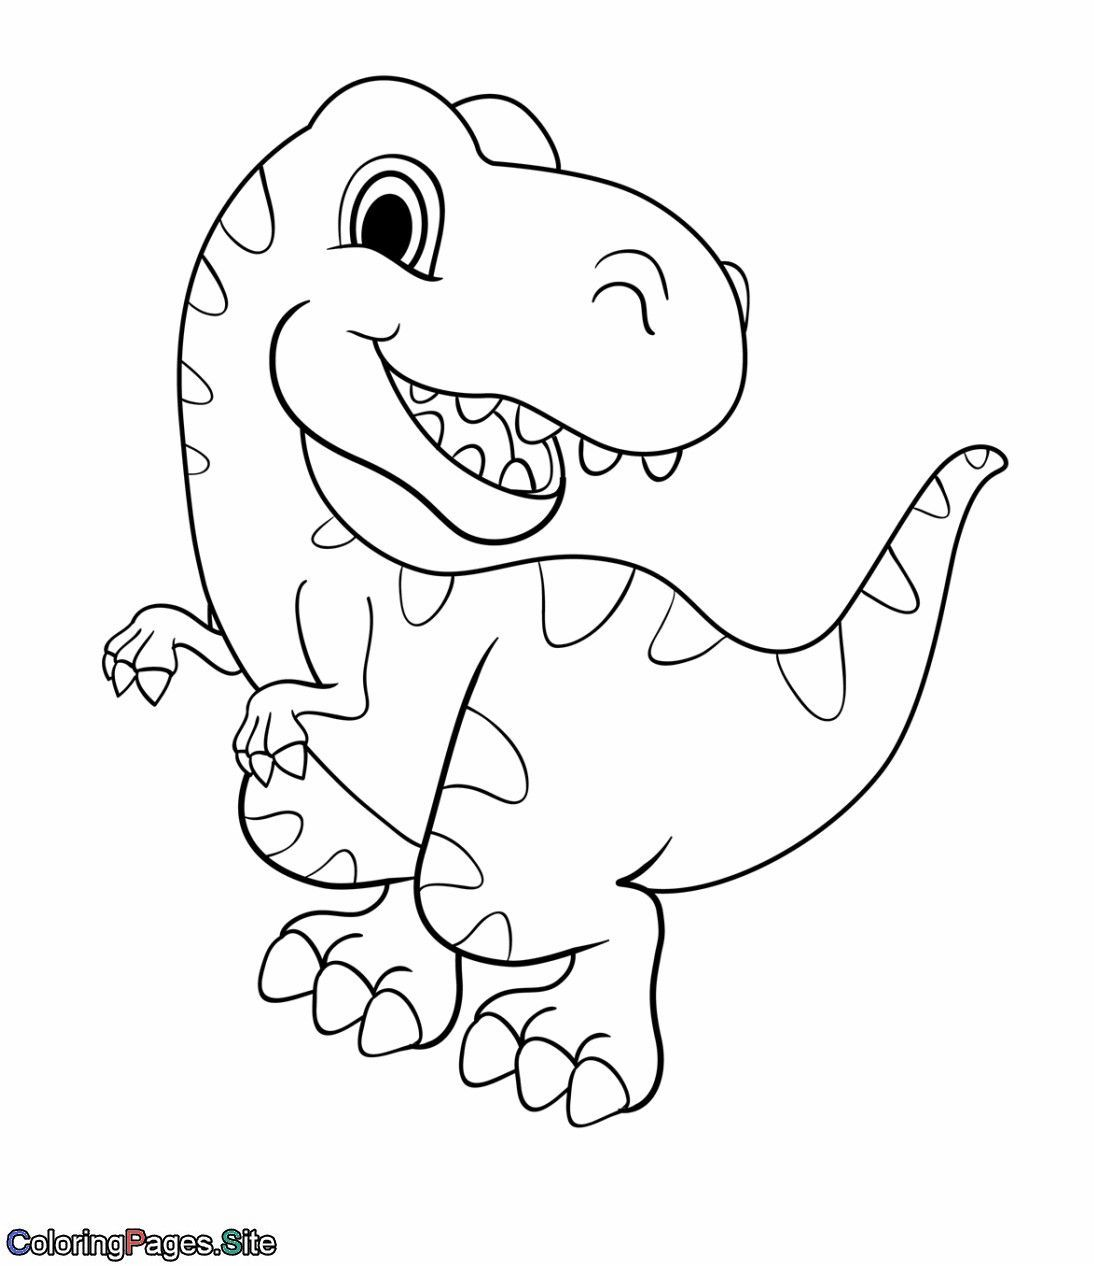 Dinosaur Coloring Pages Cute Cartoon Dinosaur Coloring